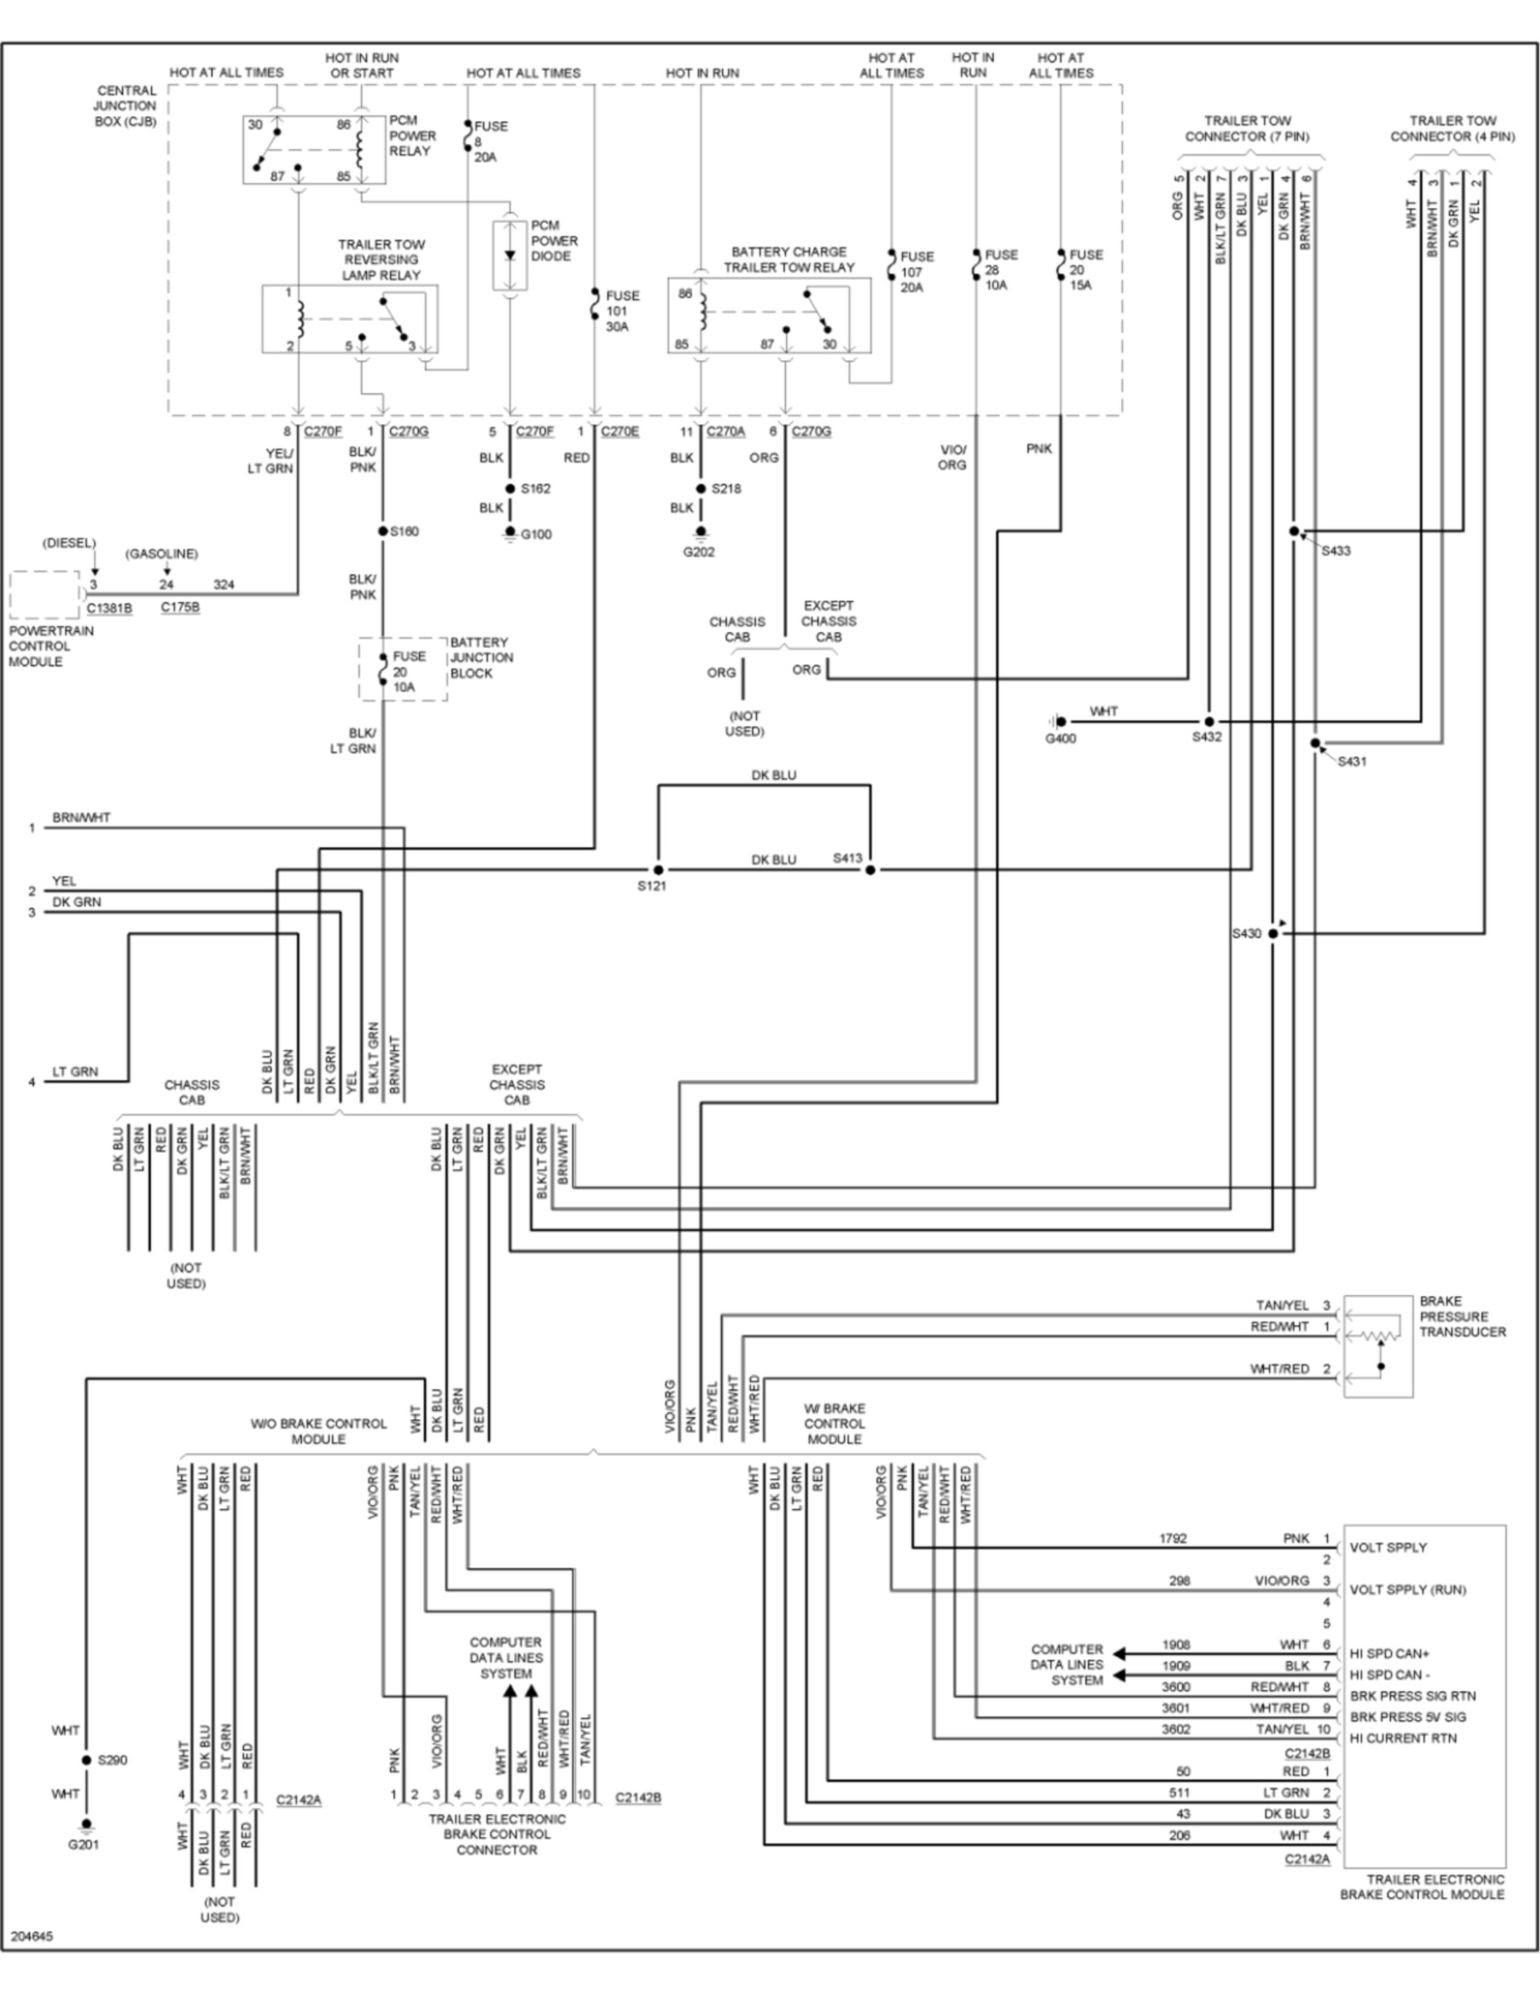 Wiring Diagram 2006 F250 Flatbed Wiring Diagram Skip Pride Skip Pride Lastanzadeltempo It